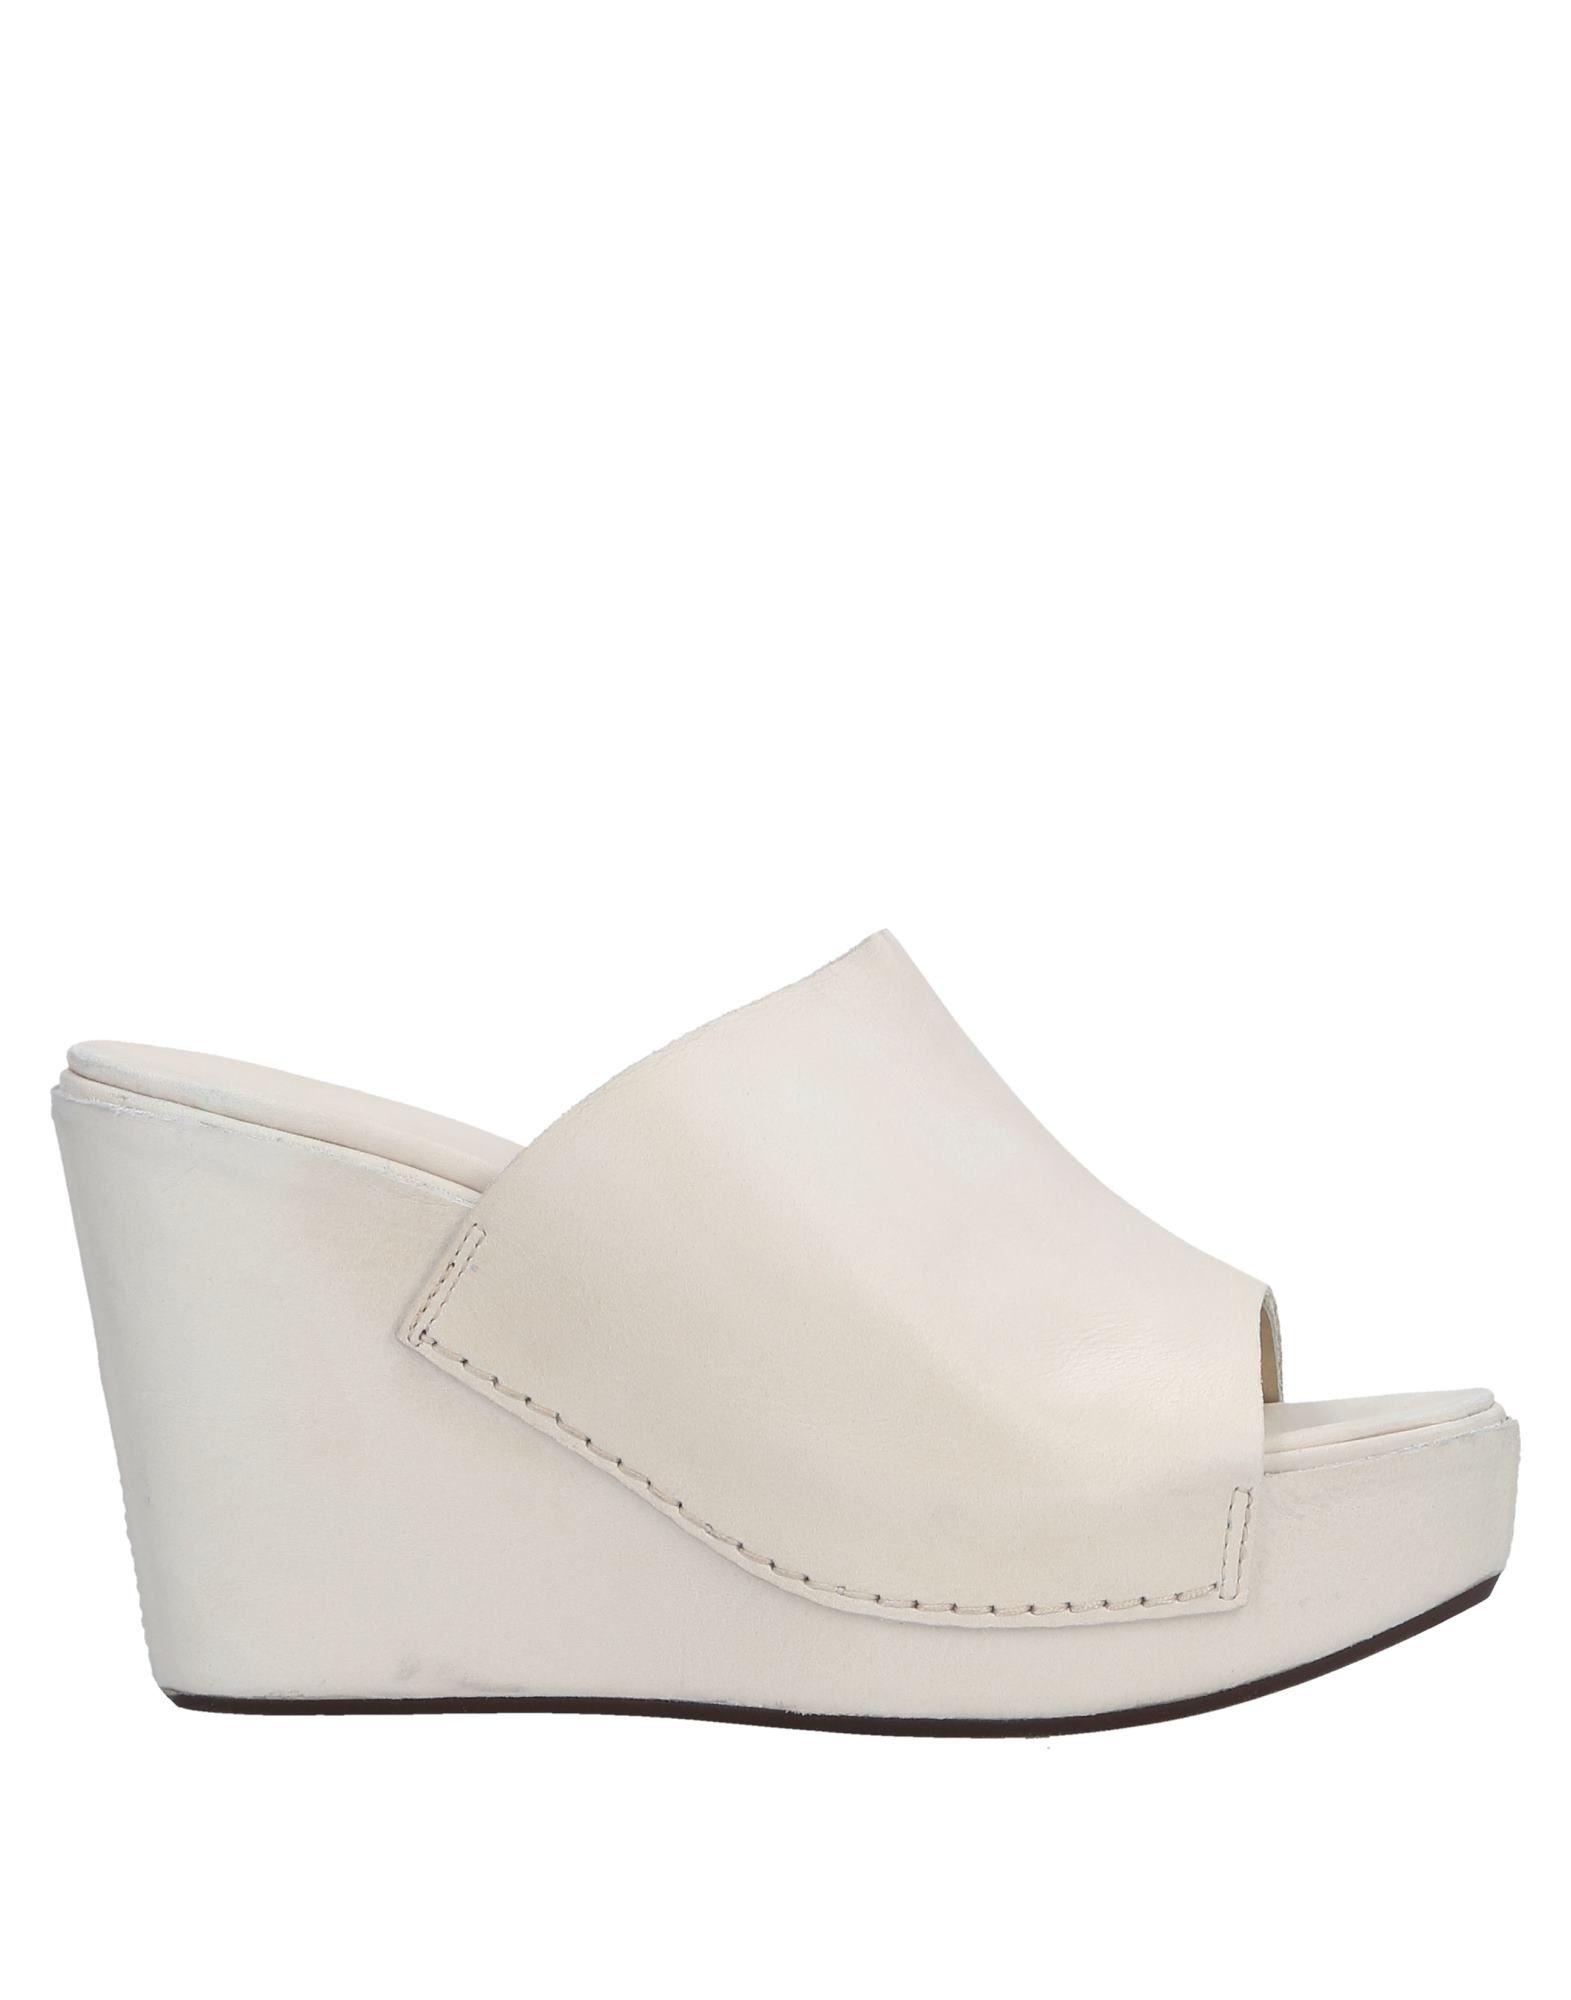 Criteria Sandalen Damen  11535723IQ Gute Qualität beliebte Schuhe